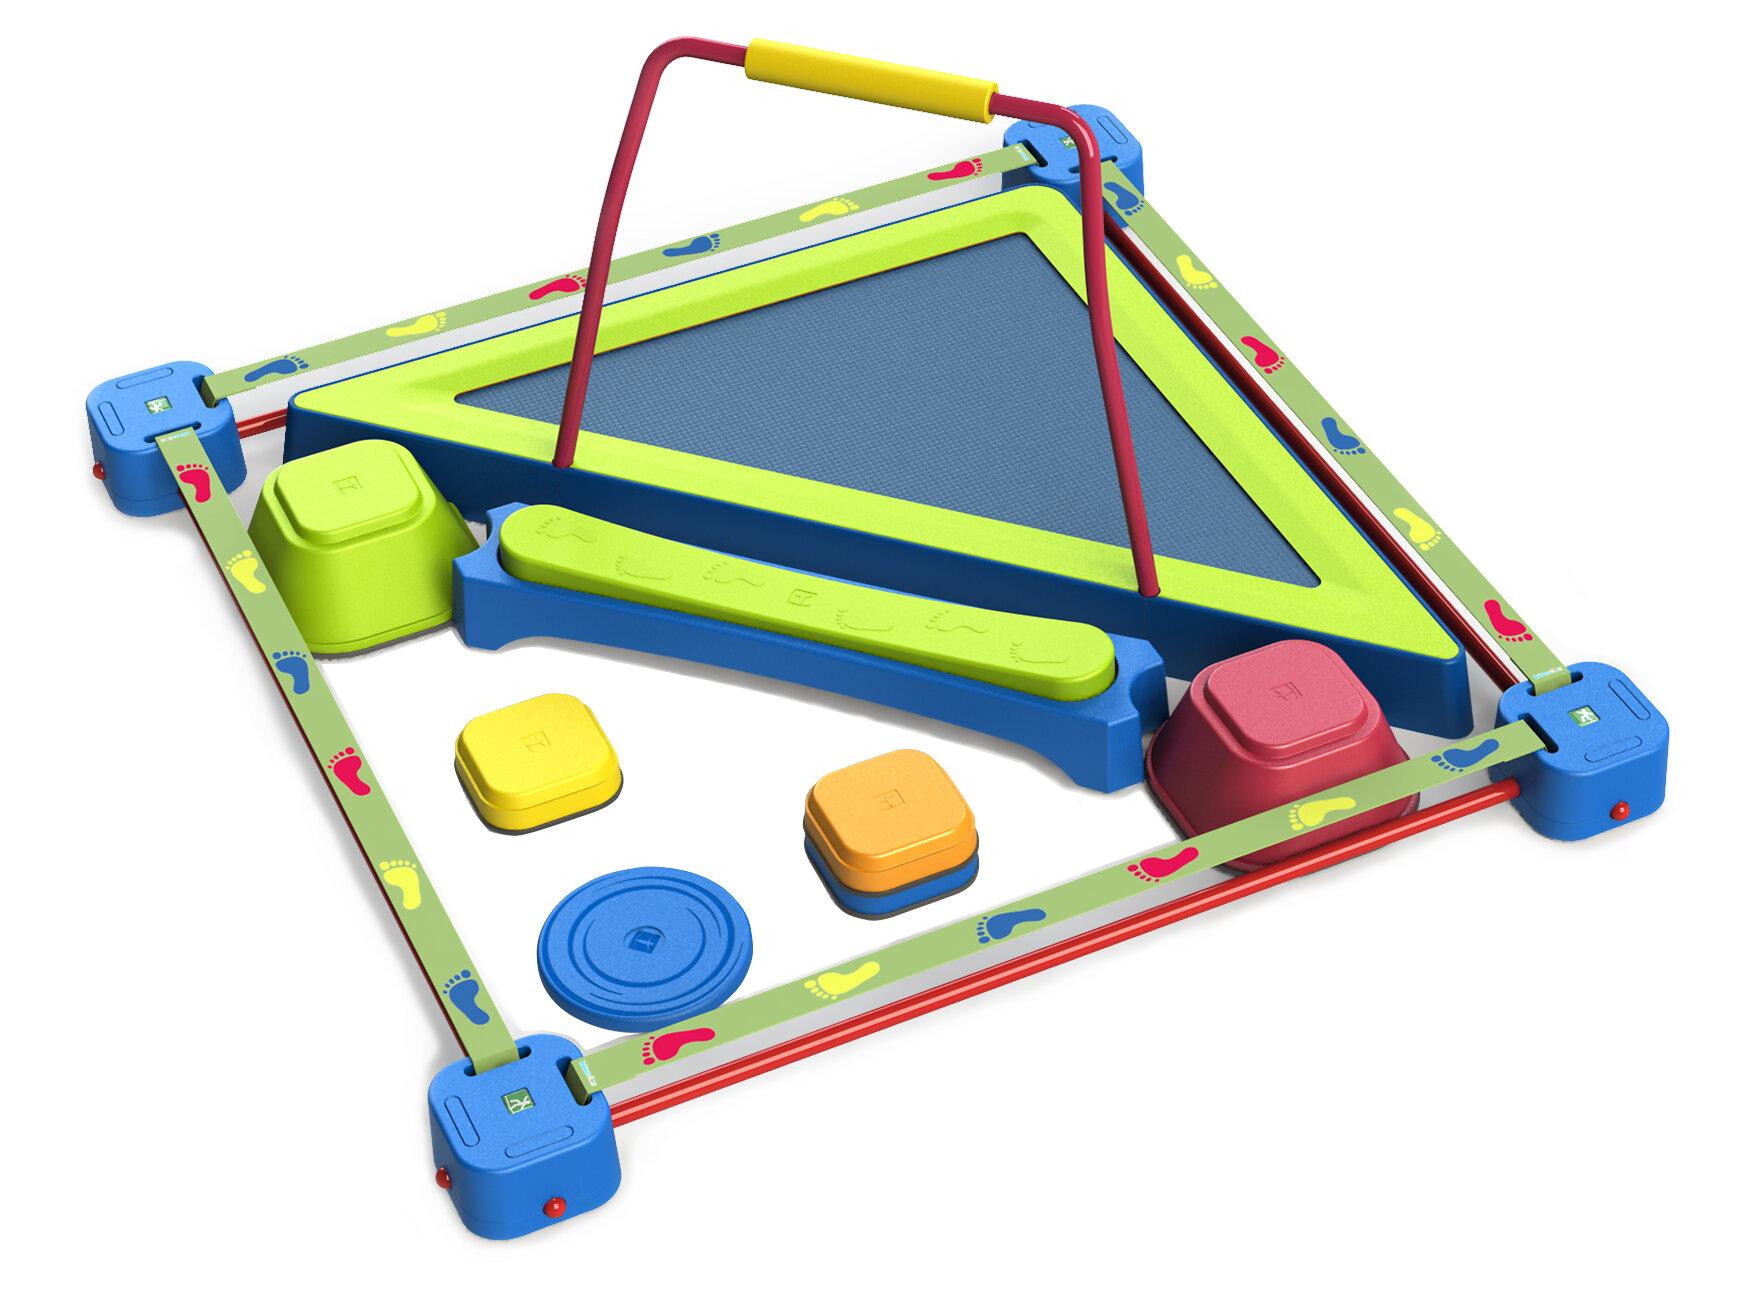 slackers playzone fit starter kit wayfair